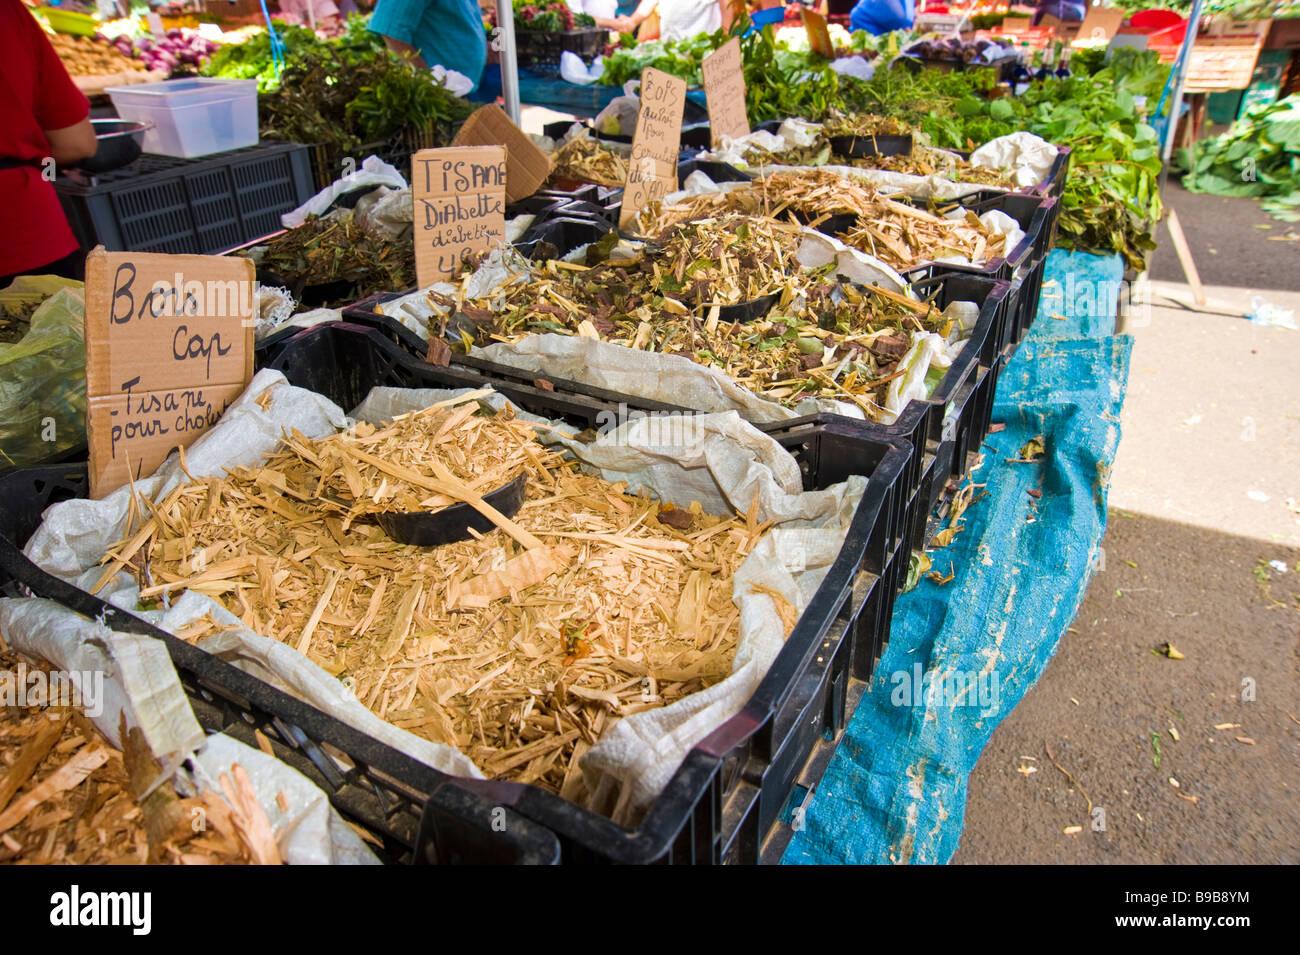 Tropical herbs and fruit on a market at Saint Denis, La Réunion, France | Tropische Heilpflanzen auf einem - Stock Image